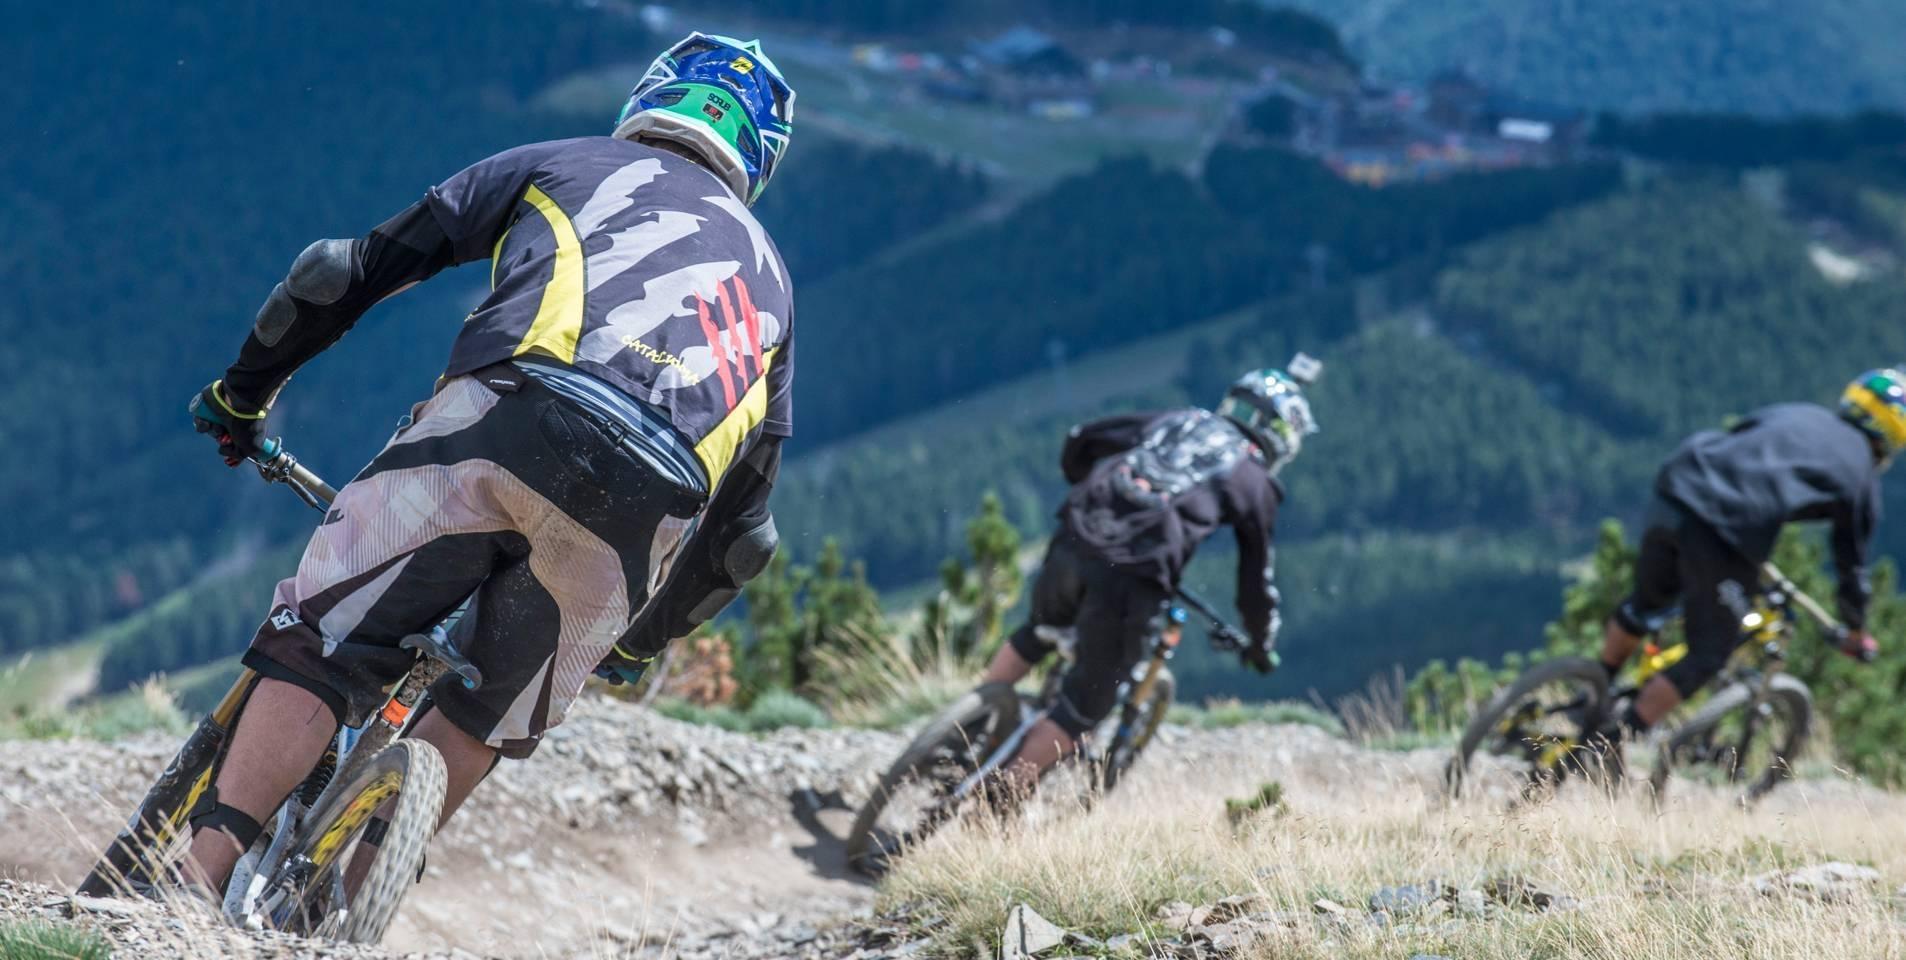 Andorra is a mountain biking mecca